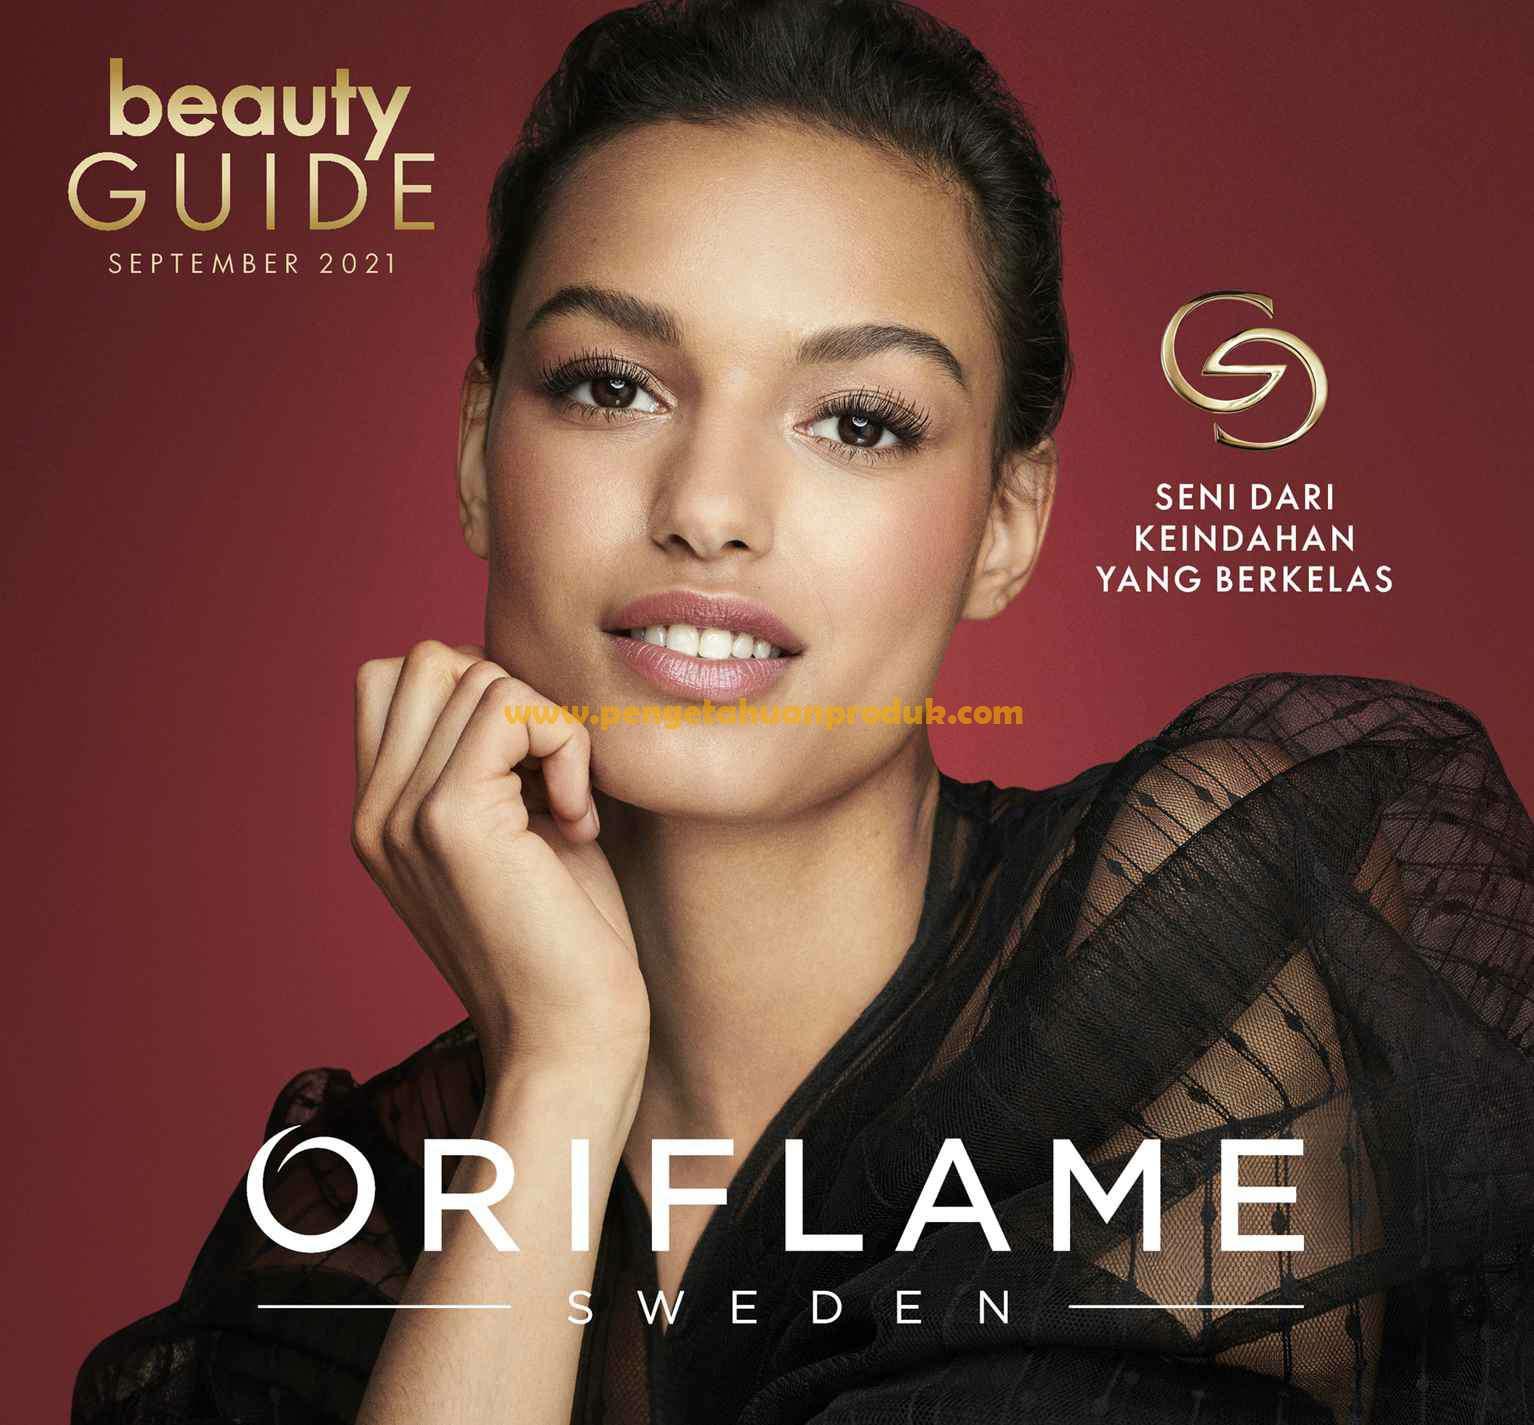 Katalog Oriflame September 2021 Gambar Lengkap 100 Halaman